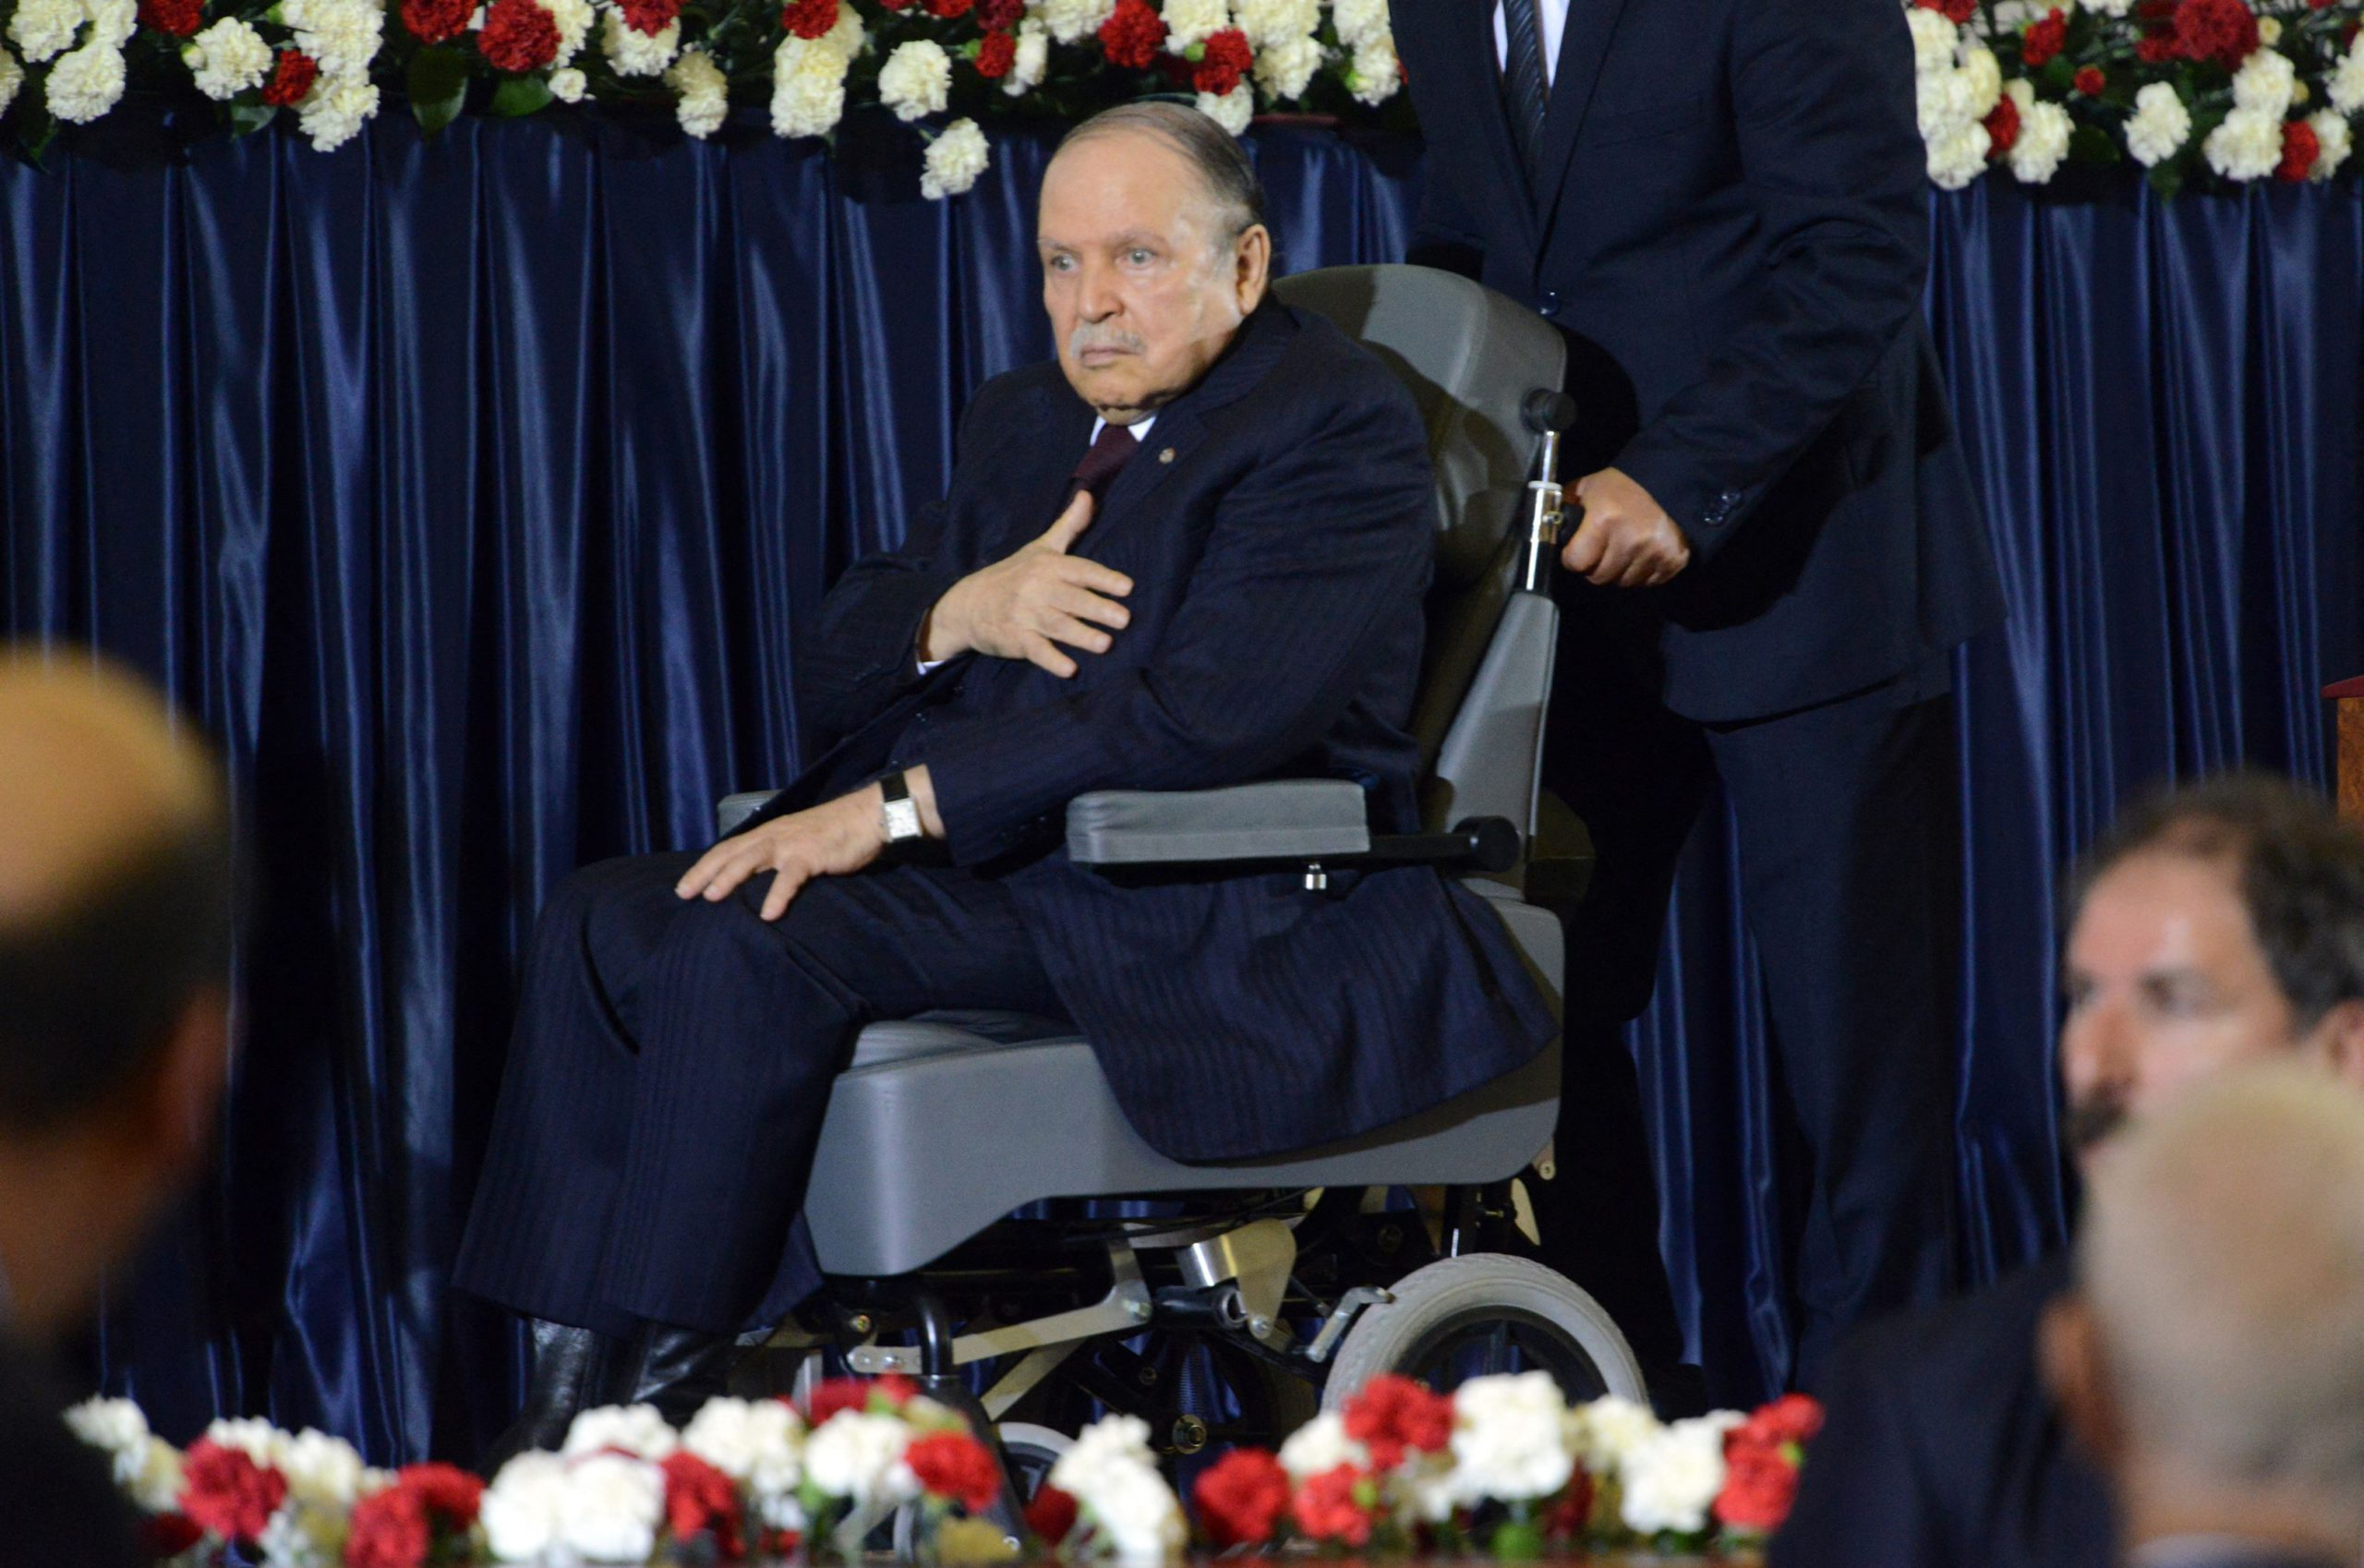 Former Algerian President Abdelaziz Buteflika dies at 84